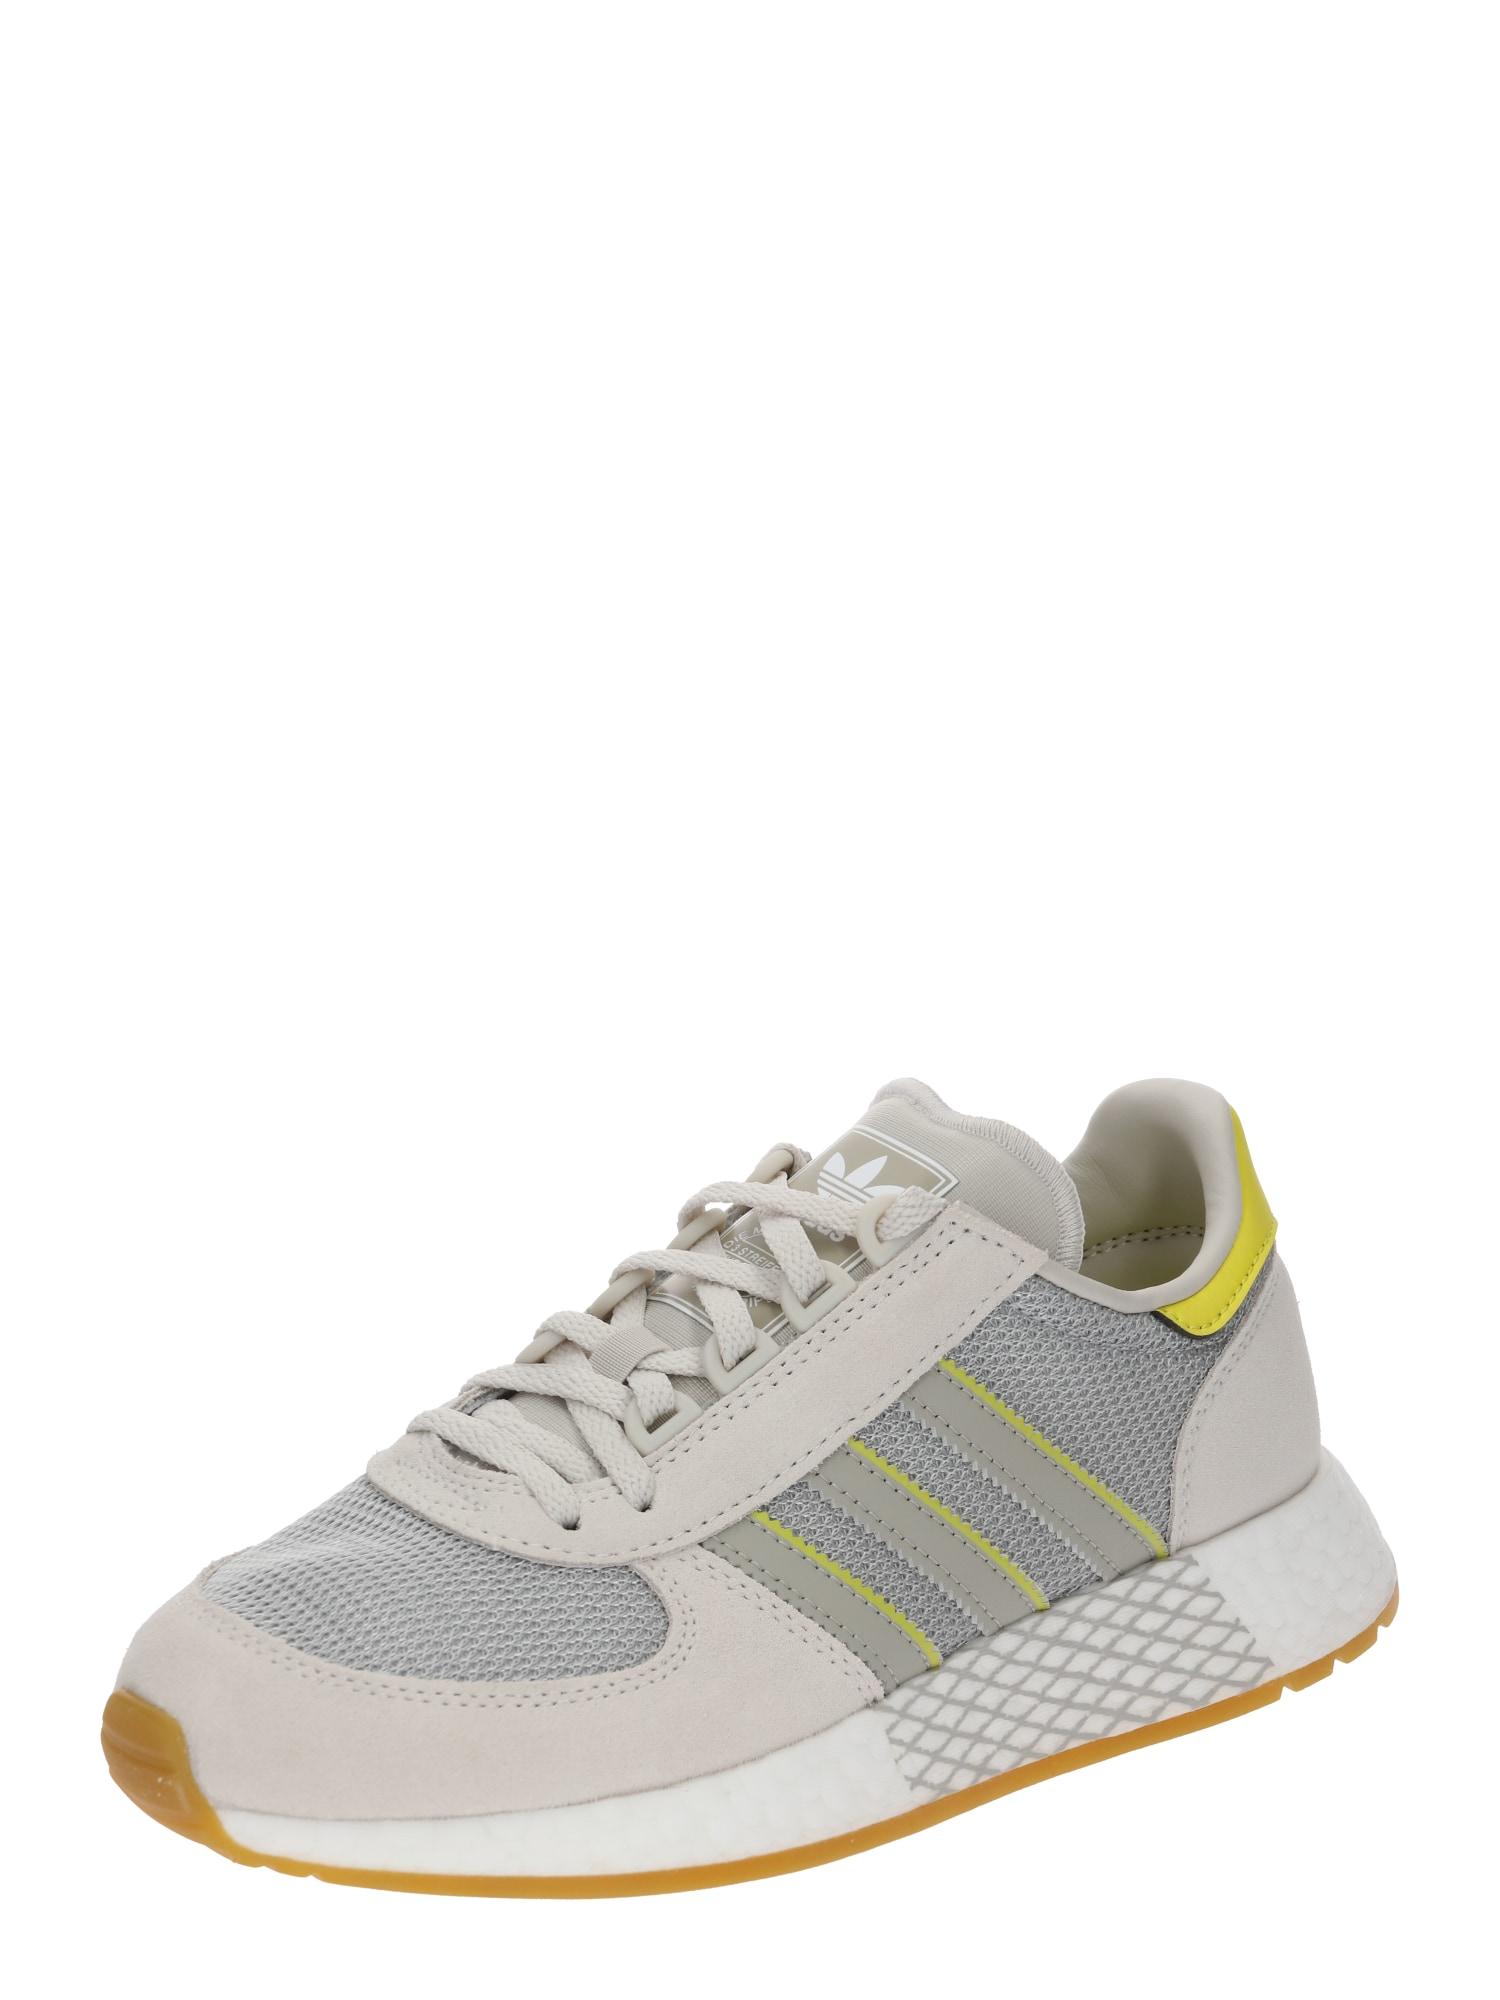 Tenisky Marathon Techu W žlutá režná světle šedá ADIDAS ORIGINALS